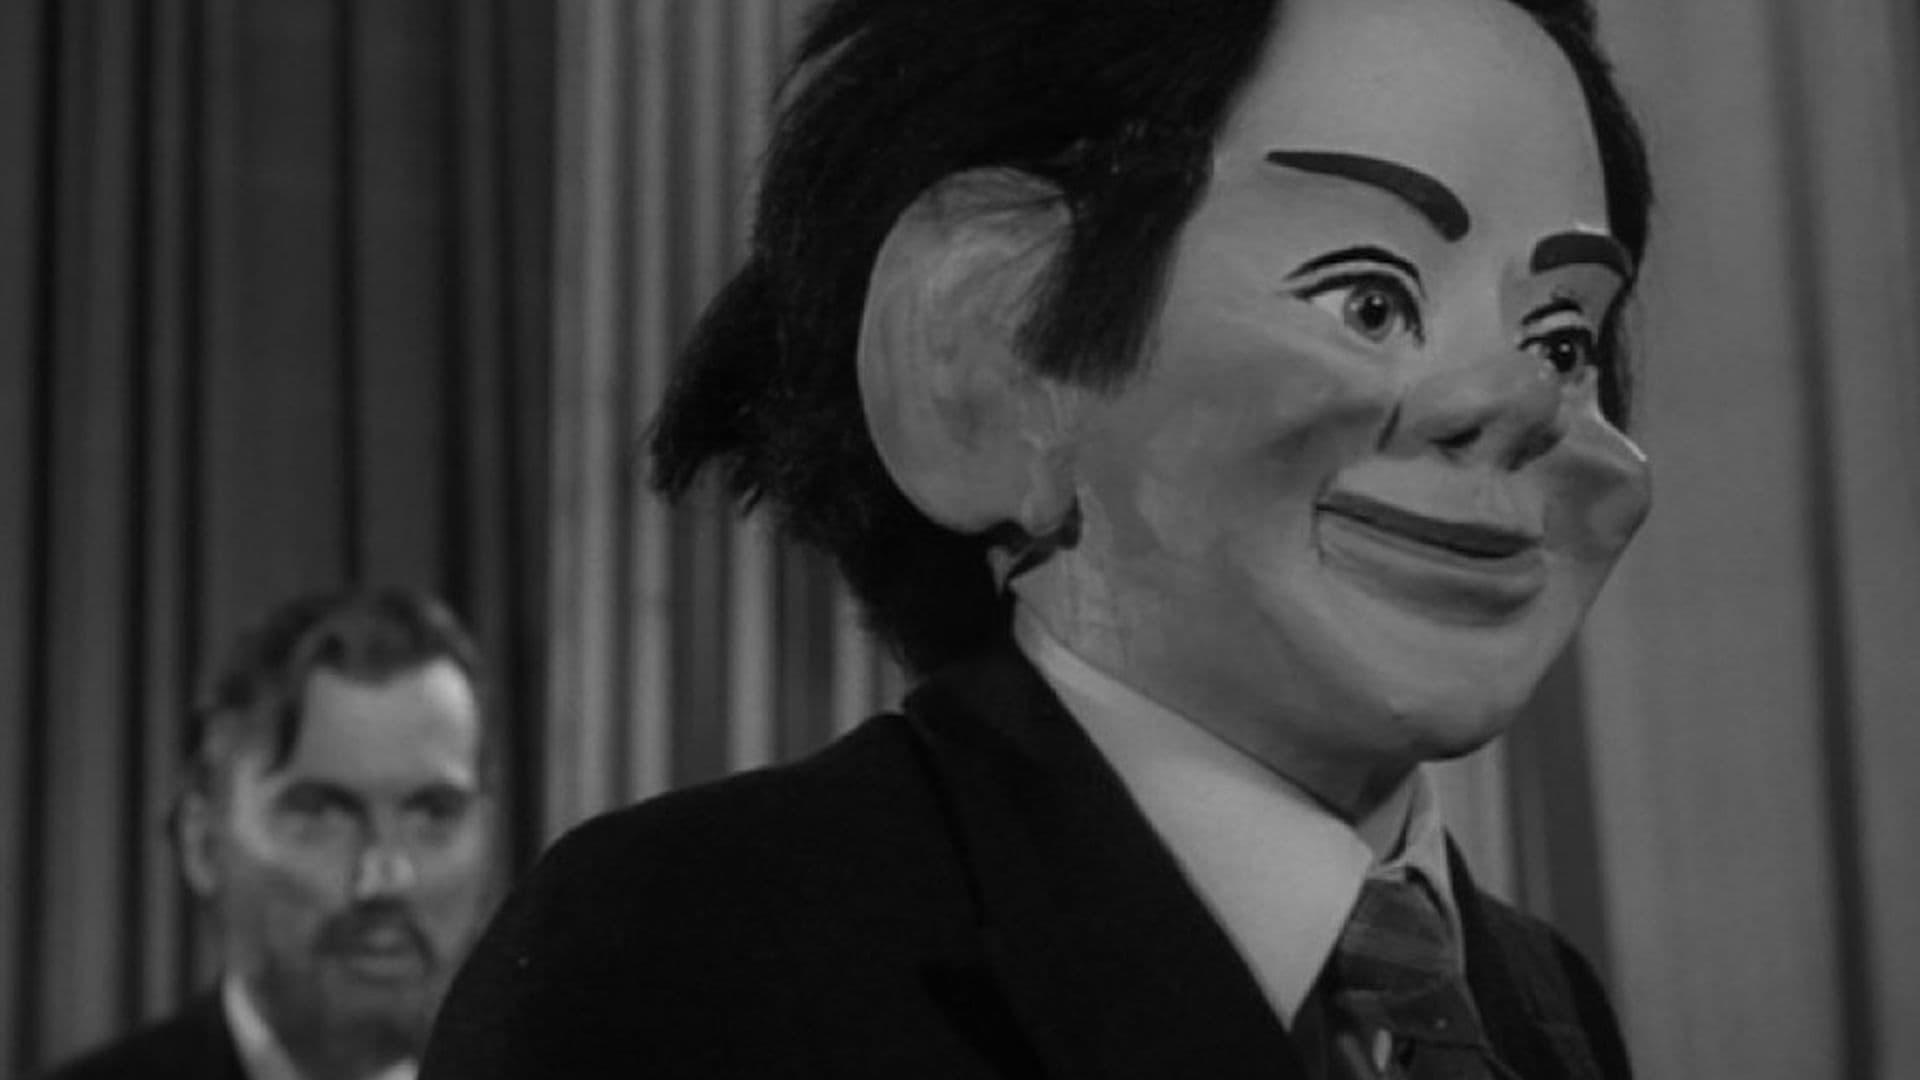 Movie Poster 2019: Devil Doll (1964)